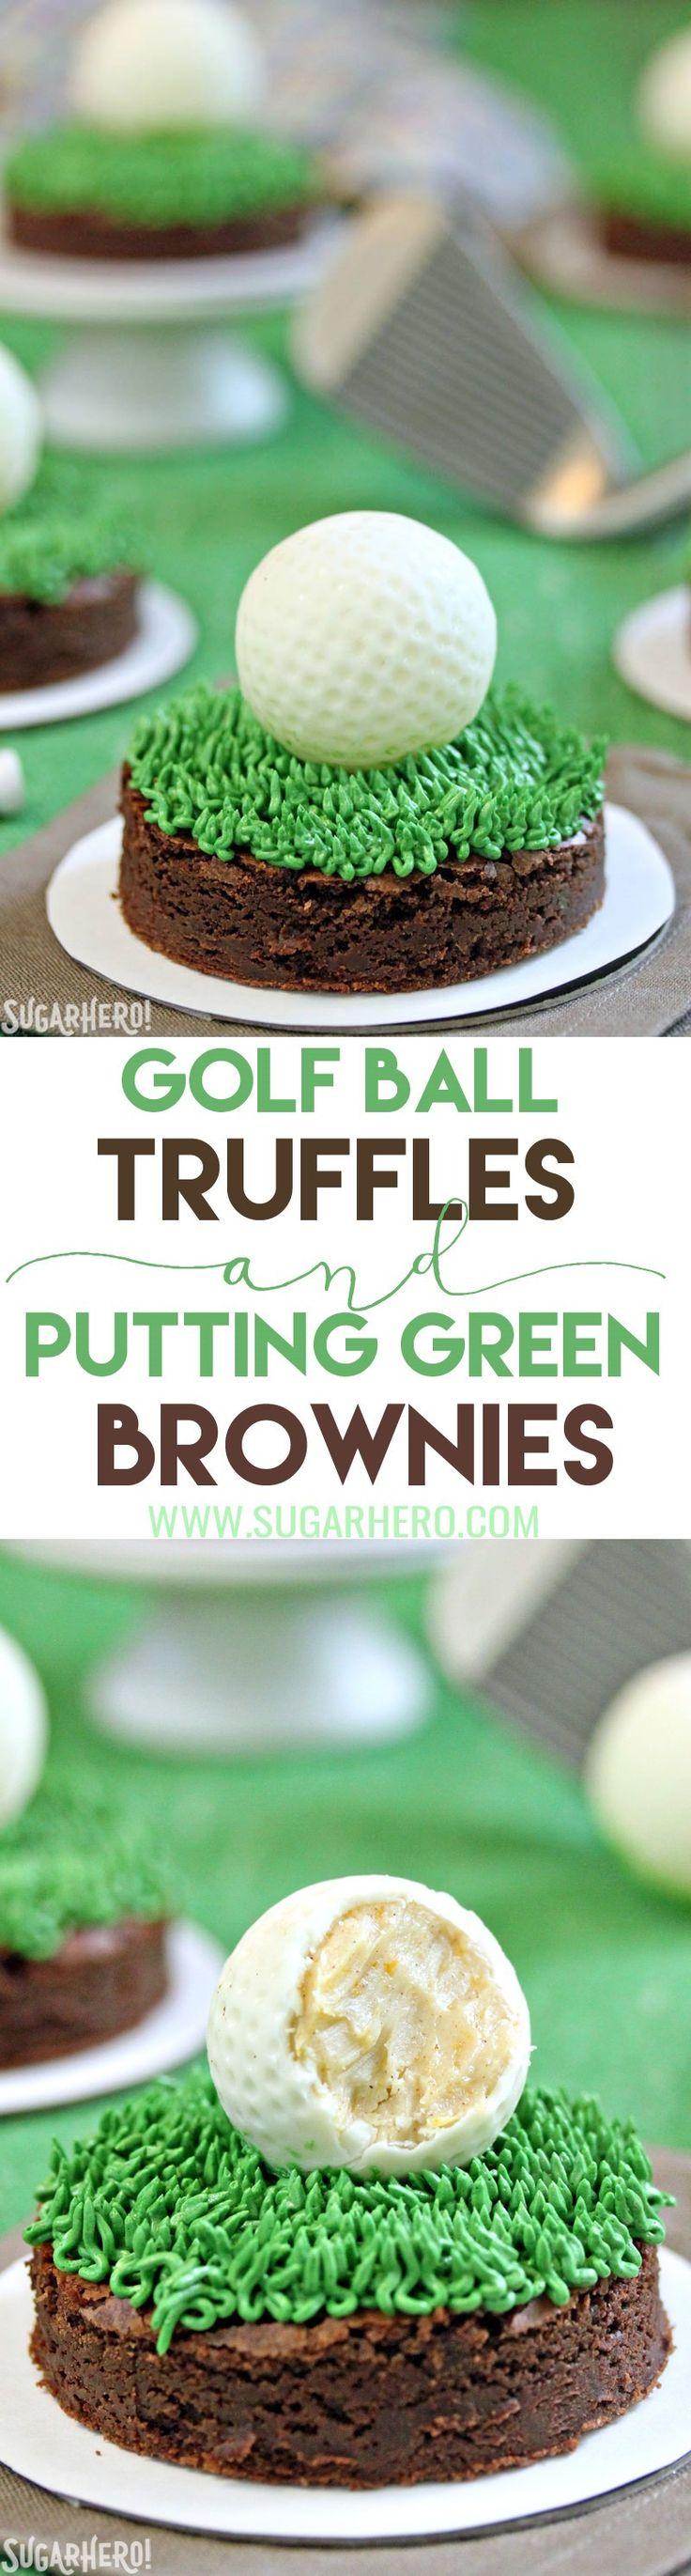 "Golf Ball Truffles and Putting Green Brownies - white chocolate rum truffles that look just like golf balls! Put them on ""putting green"" brownies to make the cutest dessert ever. | From SugarHero.com"